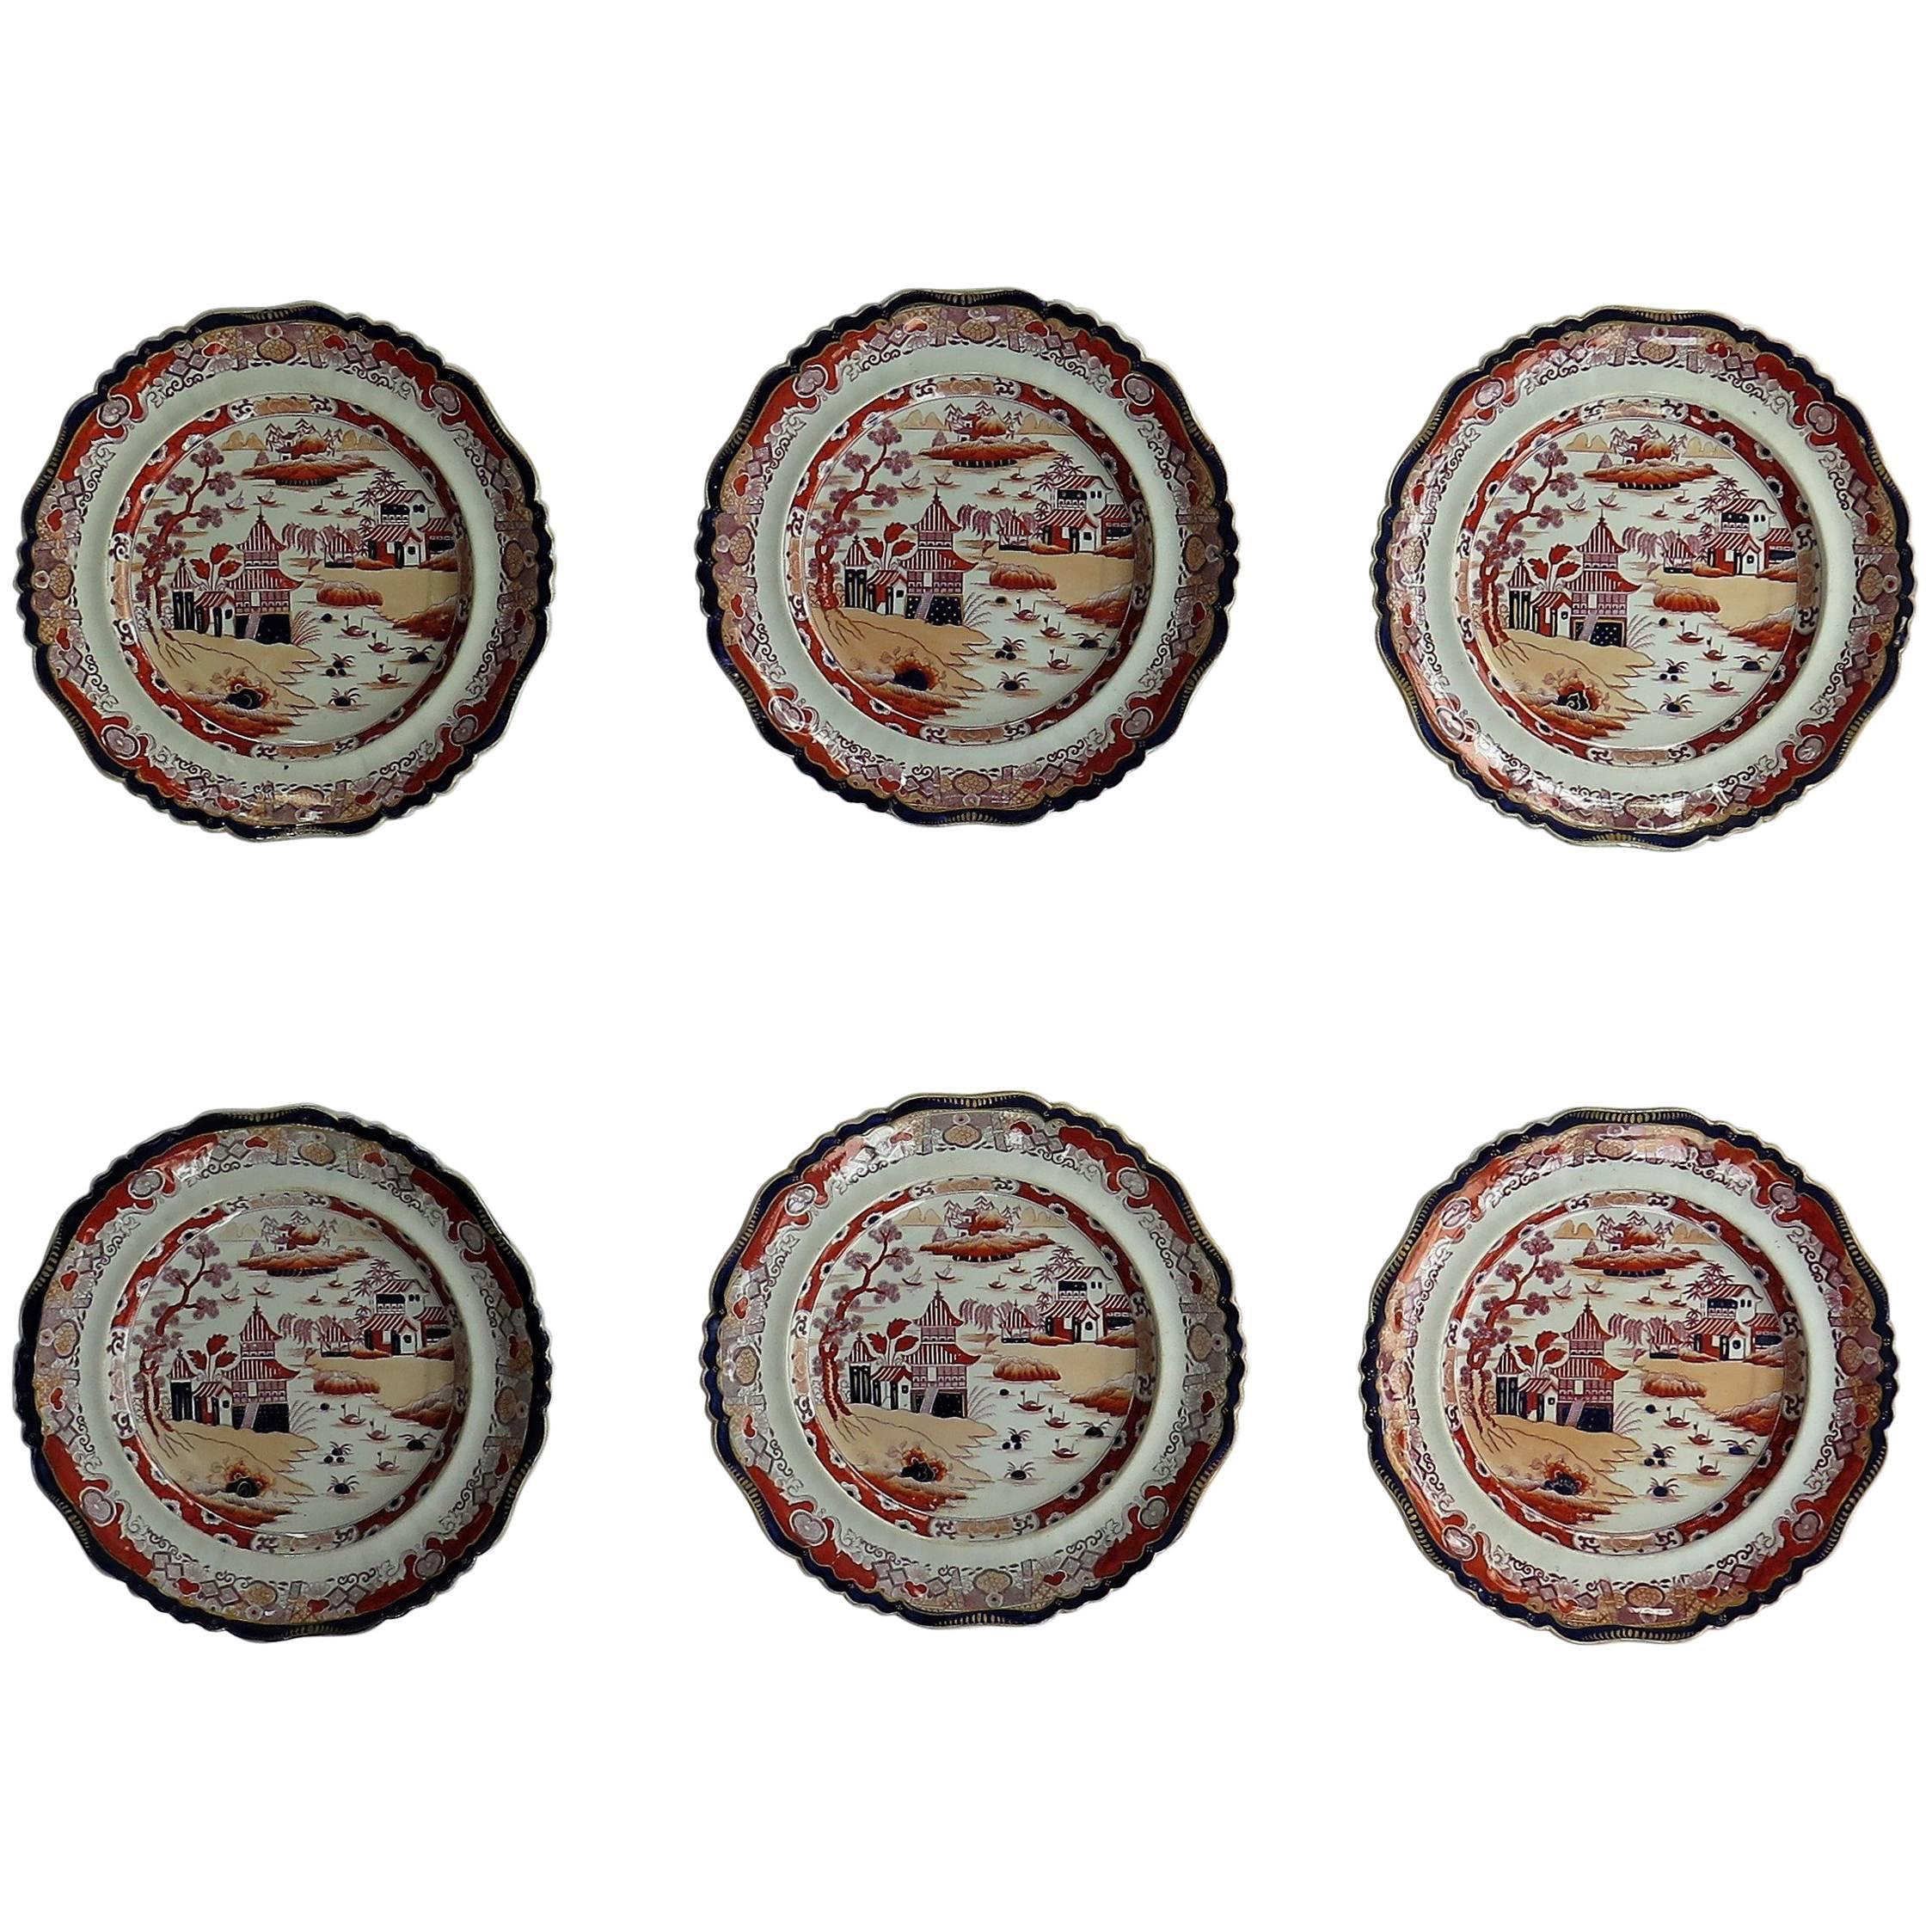 SIX Mason's Ashworth's Ironstone Large Dinner Plates Chinoiserie, Circa 1865